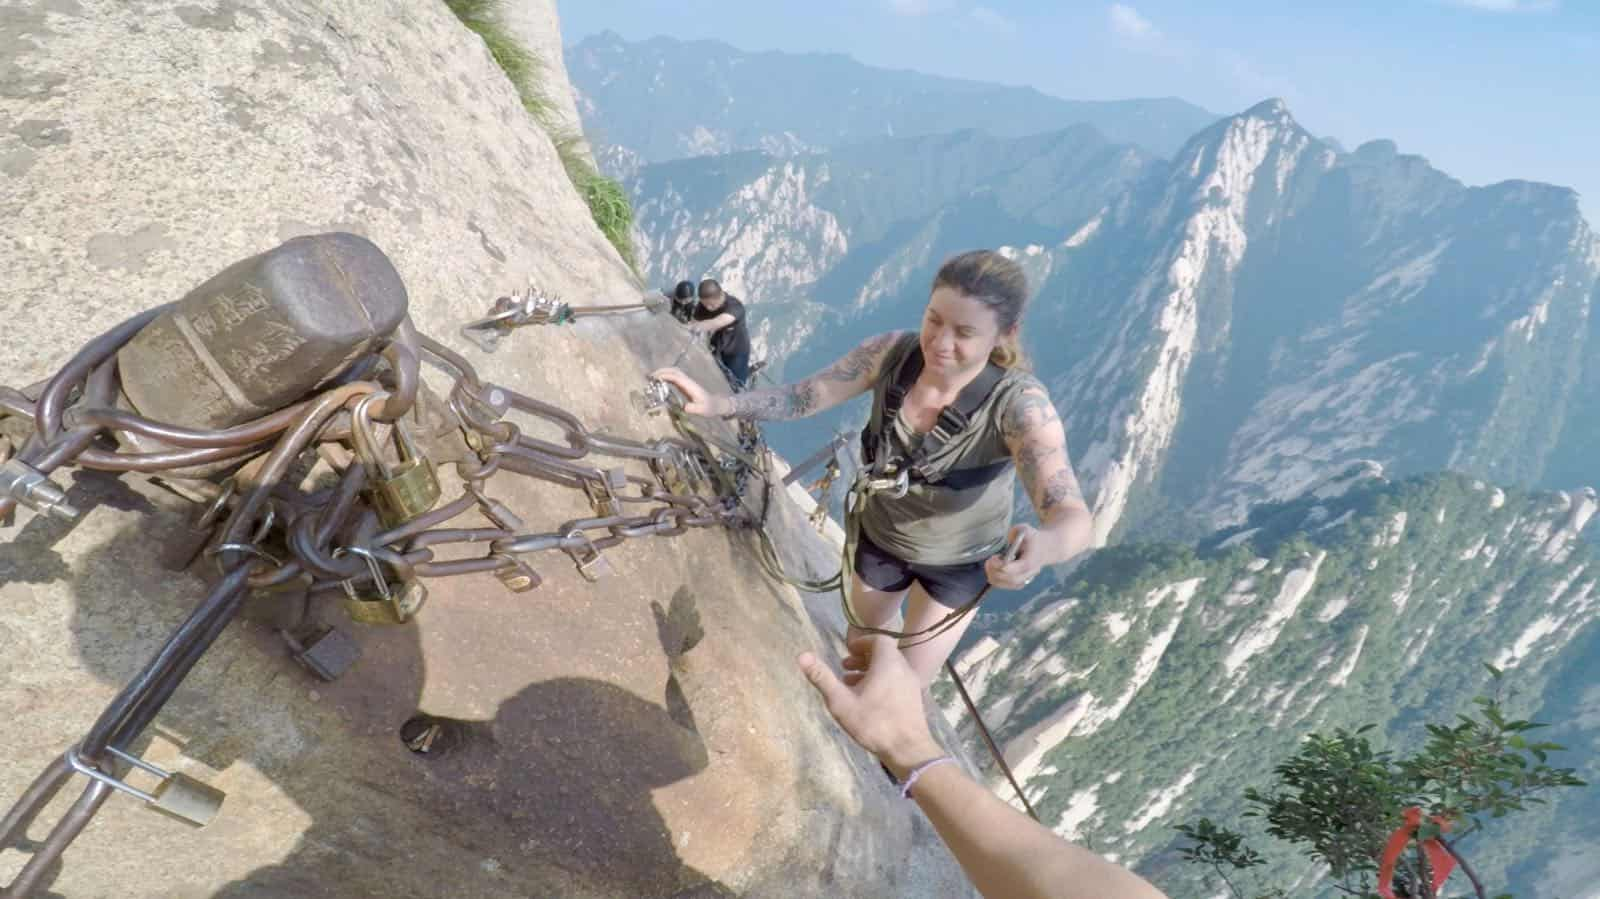 Hannah betternotstop China Hua Shan mountain plank walk betternotstop